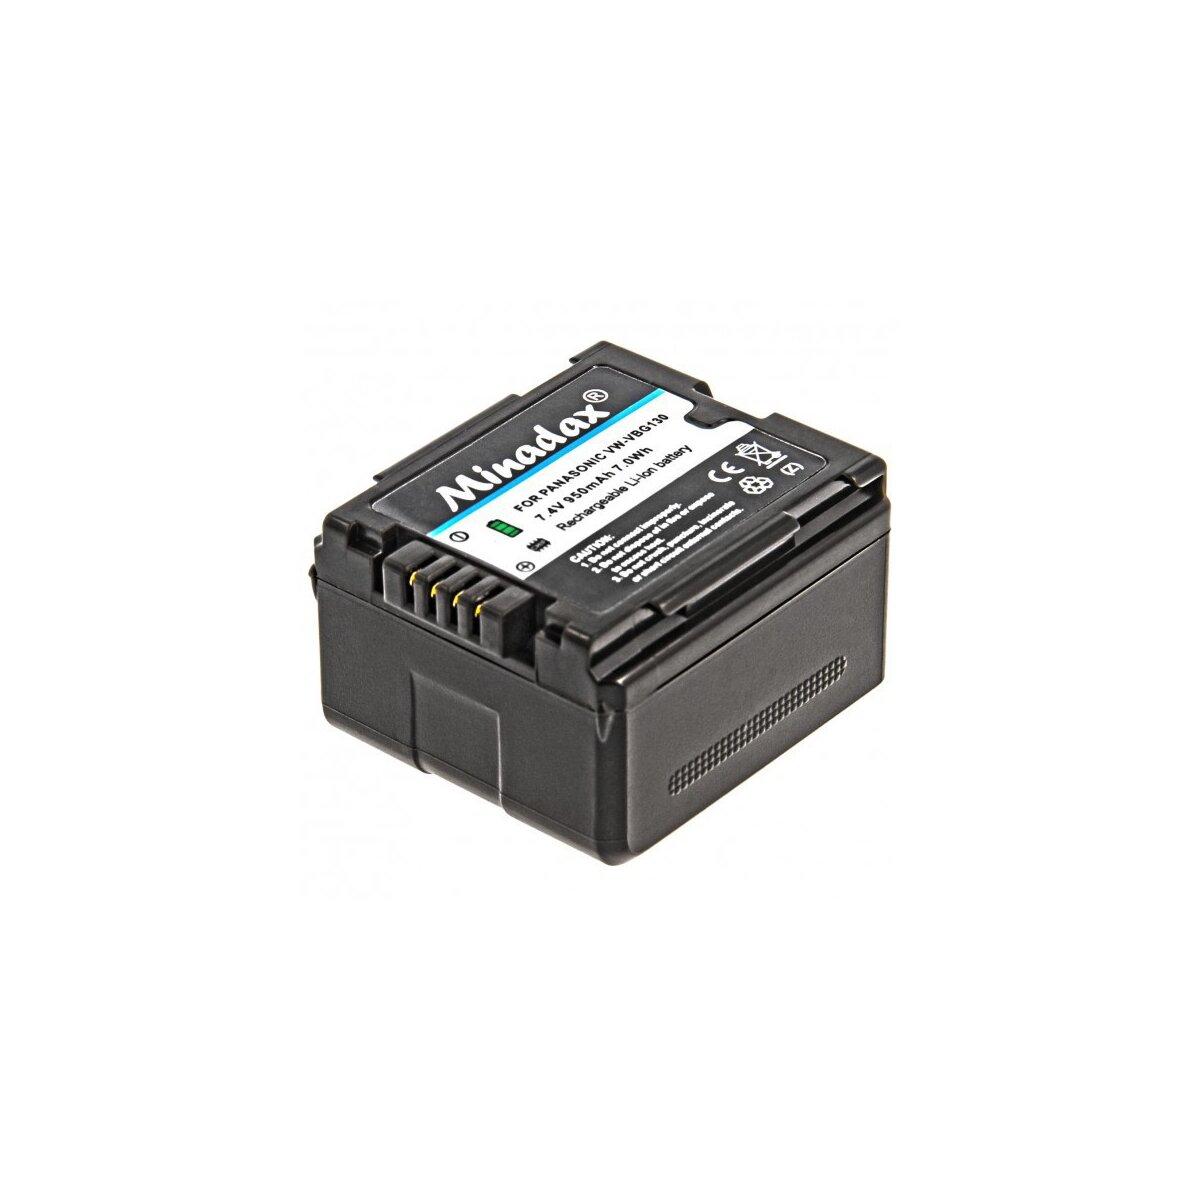 Minadax® Qualitätsakku mit echten 950 mAh kompatibel mit Panasonic HDC HS9 SX5 DX1 TM350 SD100 SD200 SD300 SD600 SD707 HS20 HS100 HS200 HS300 TM700 H20 H40 H50 H80 H90 H250 H280, Ersatz für VW VBG130